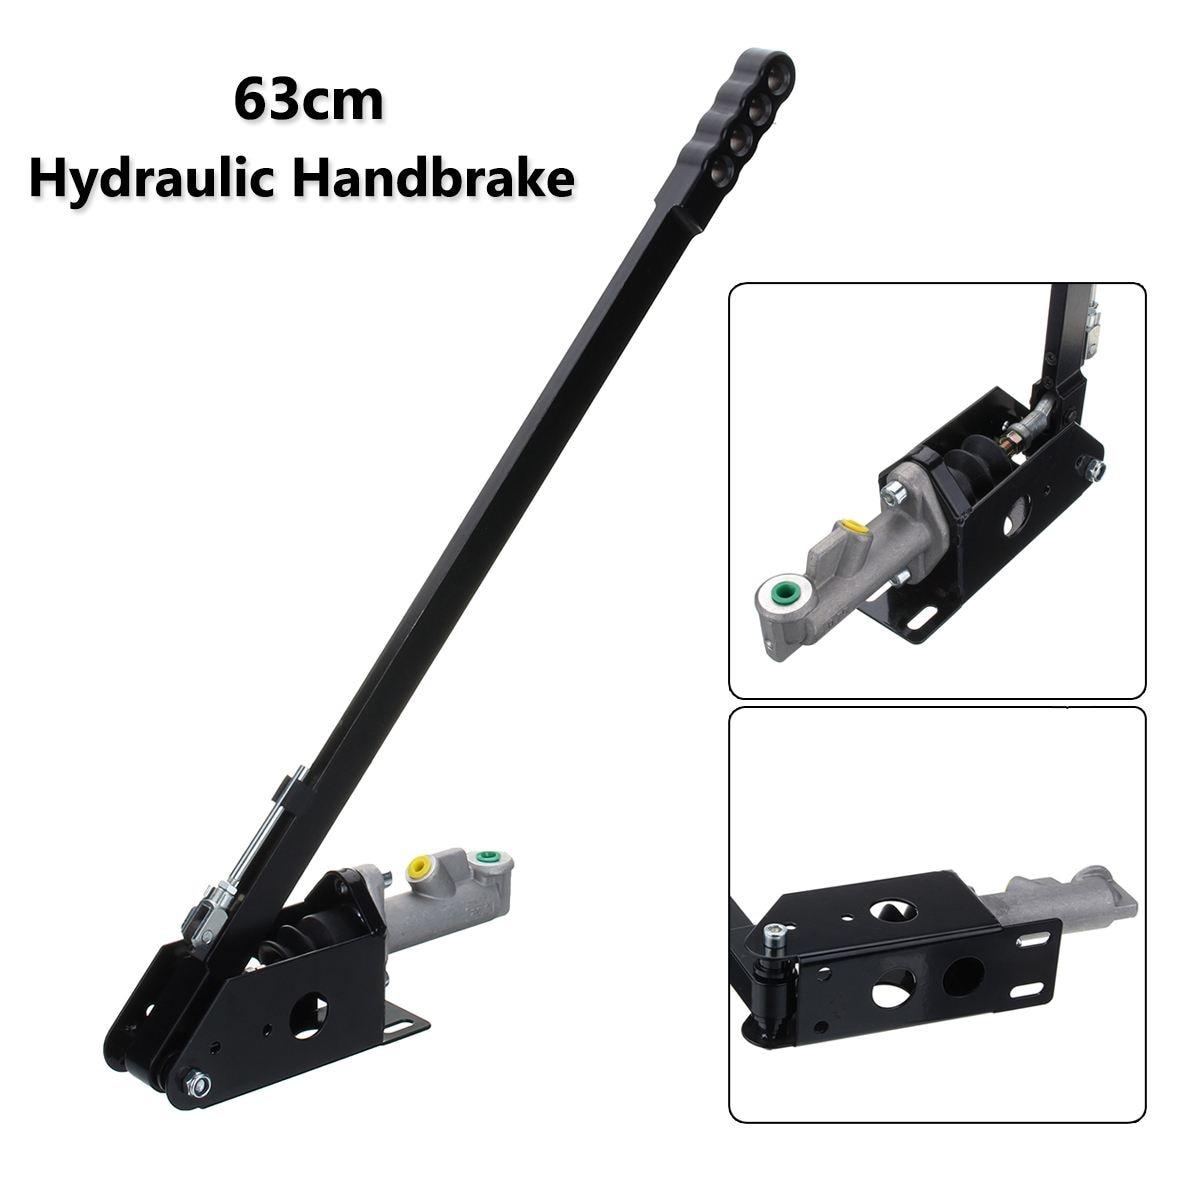 63cm Universal Long Vertical Hydraulic Handbrake Hydro E-brake Drift Race Hand Brake